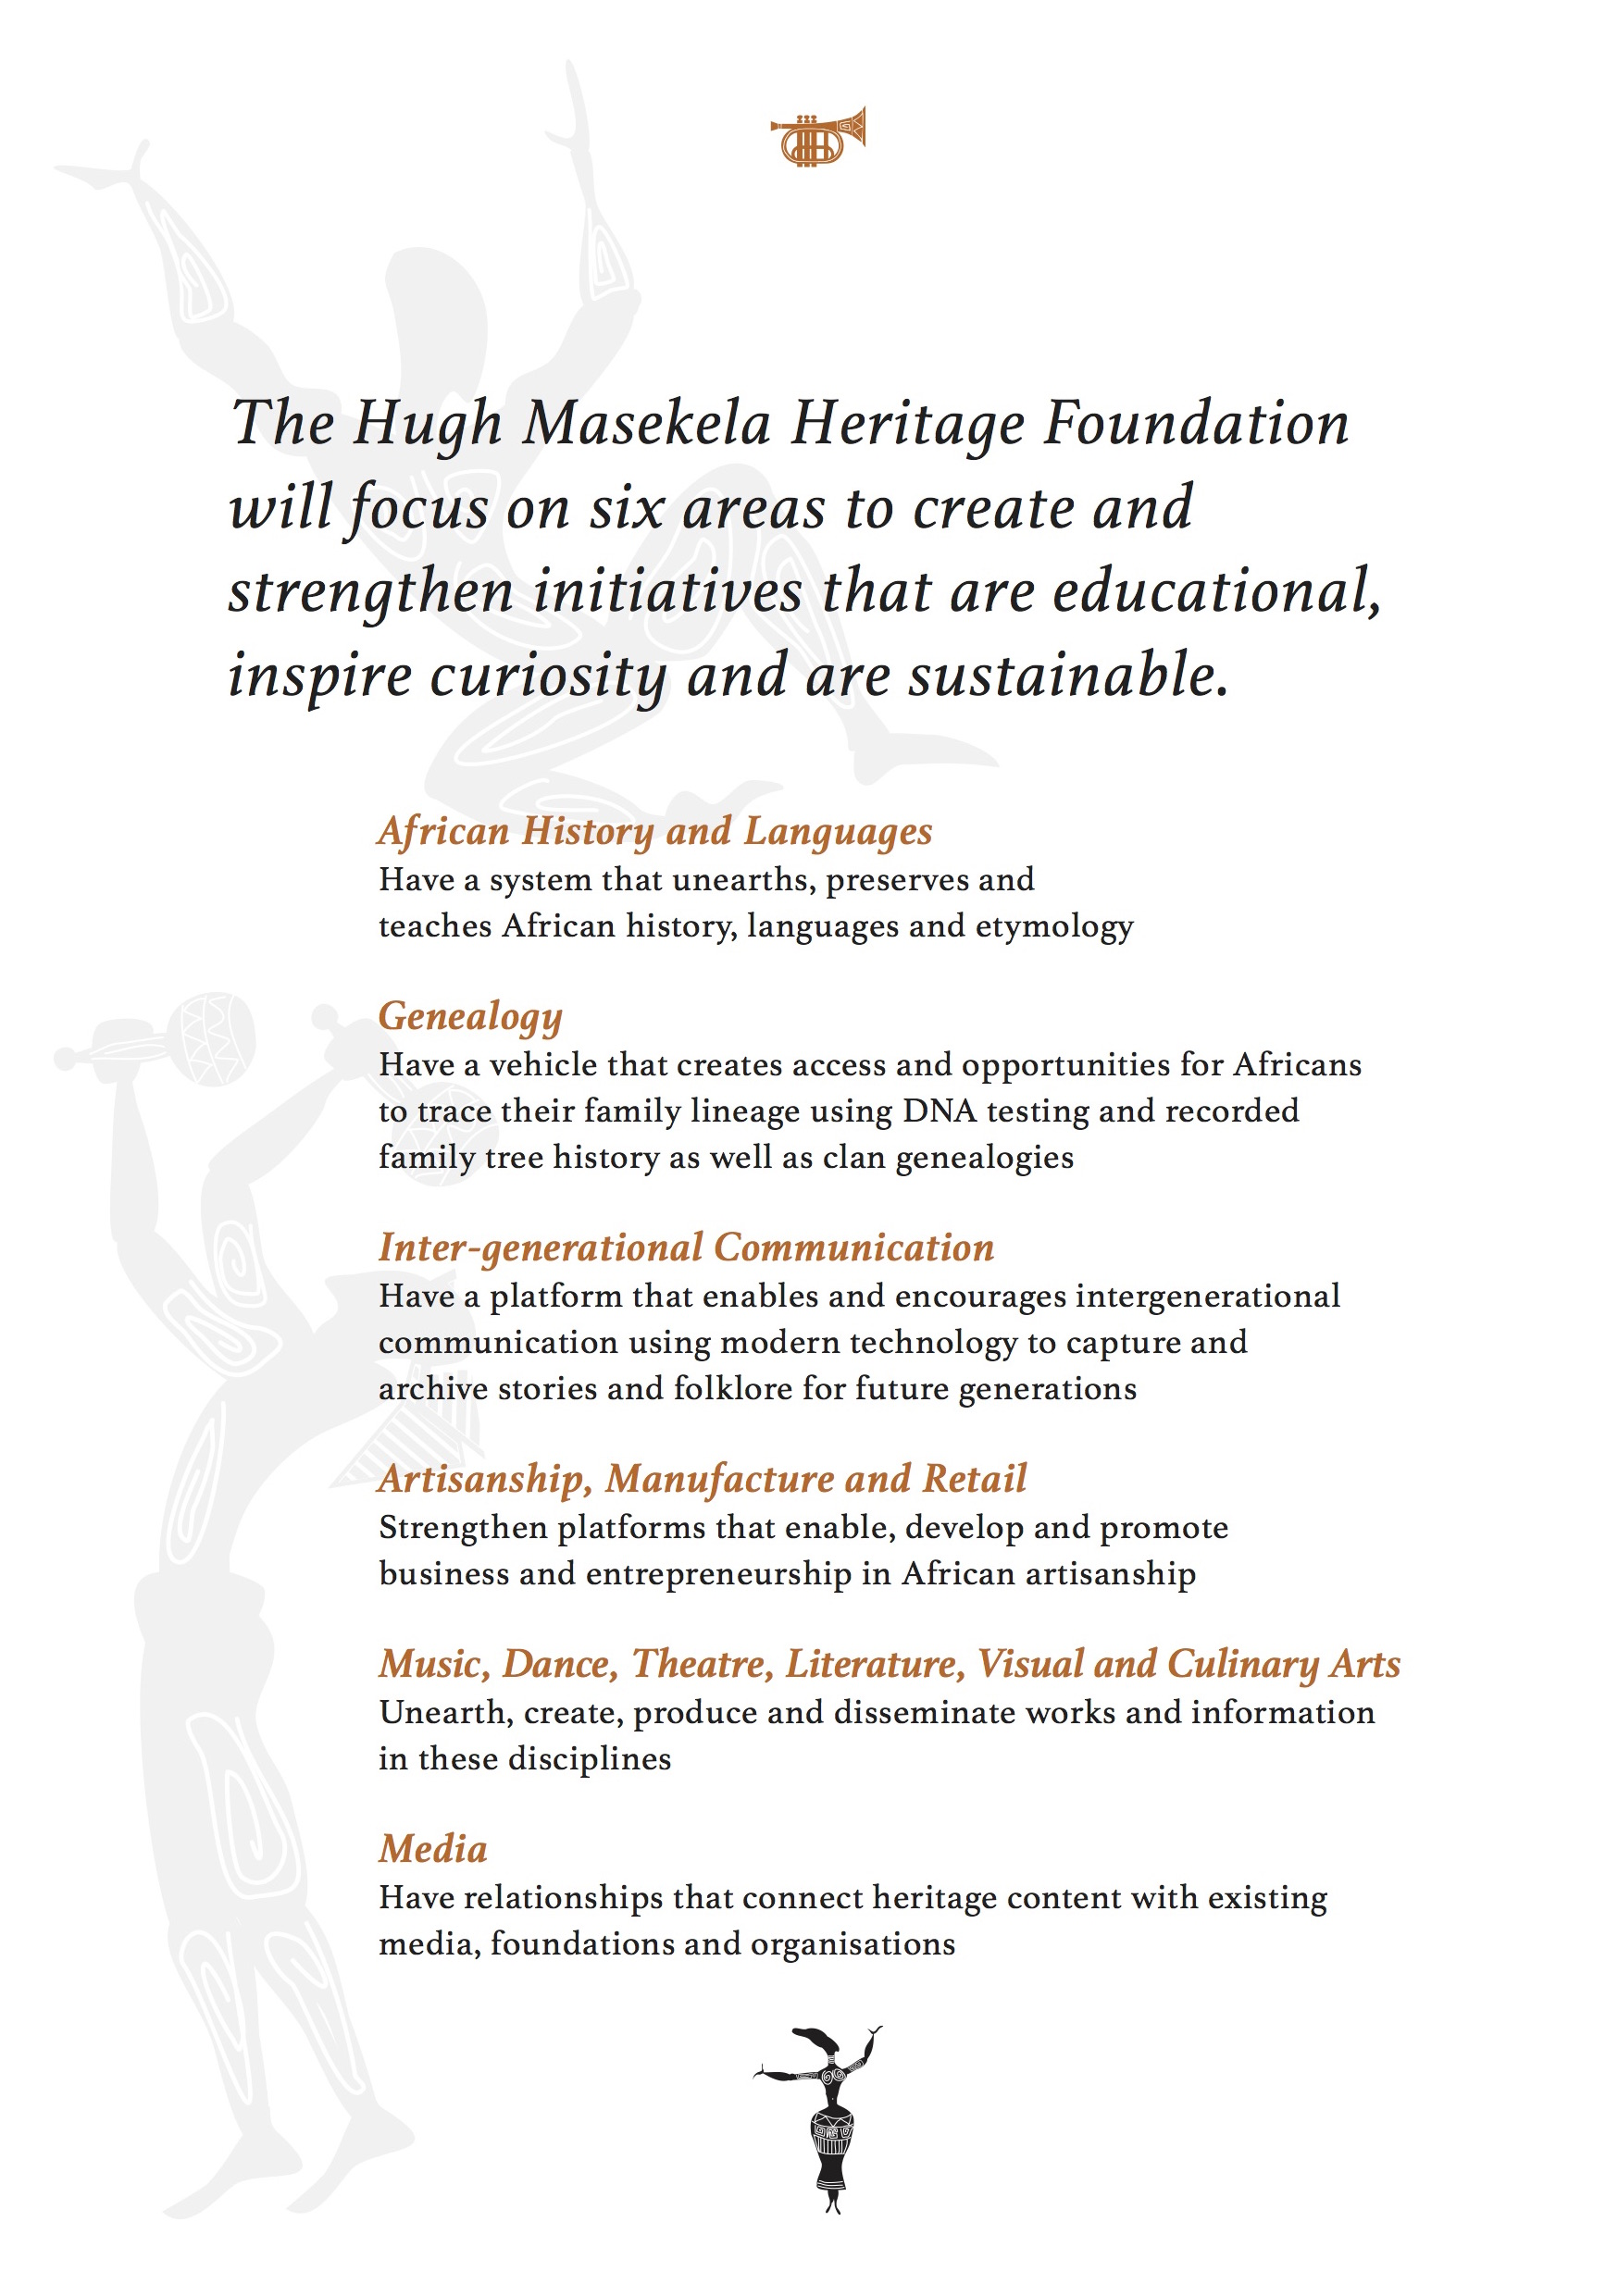 HMHF Brochure 6